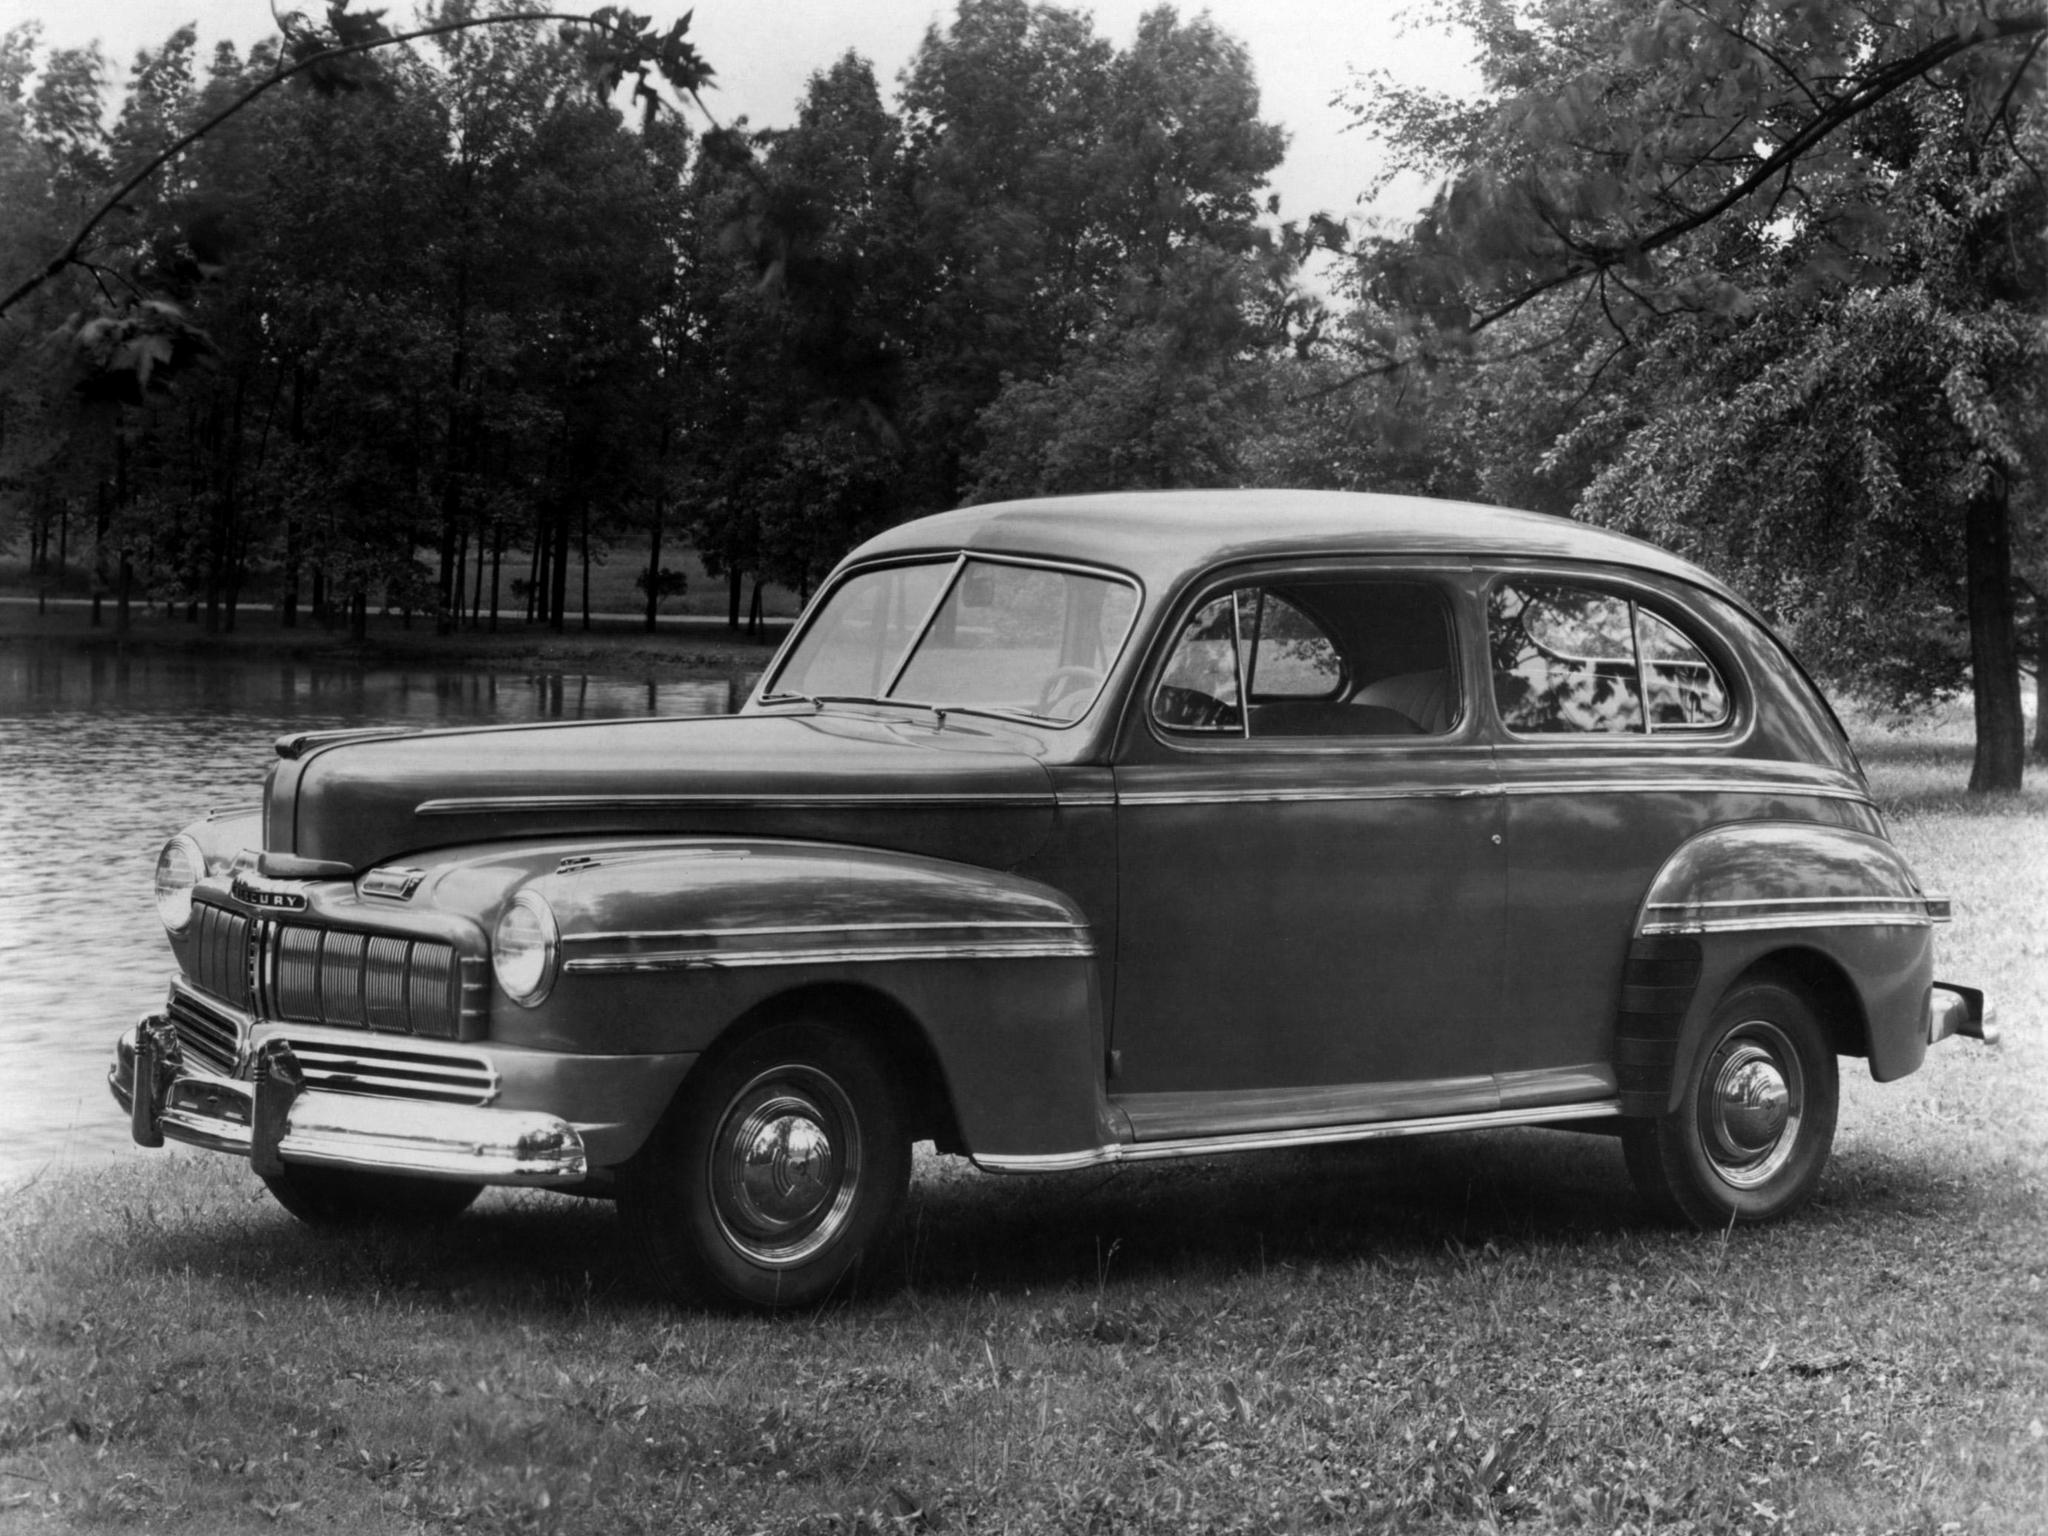 1946 mercury 2 door sedan 69m 70 retro wallpaper for 1946 mercury 4 door sedan